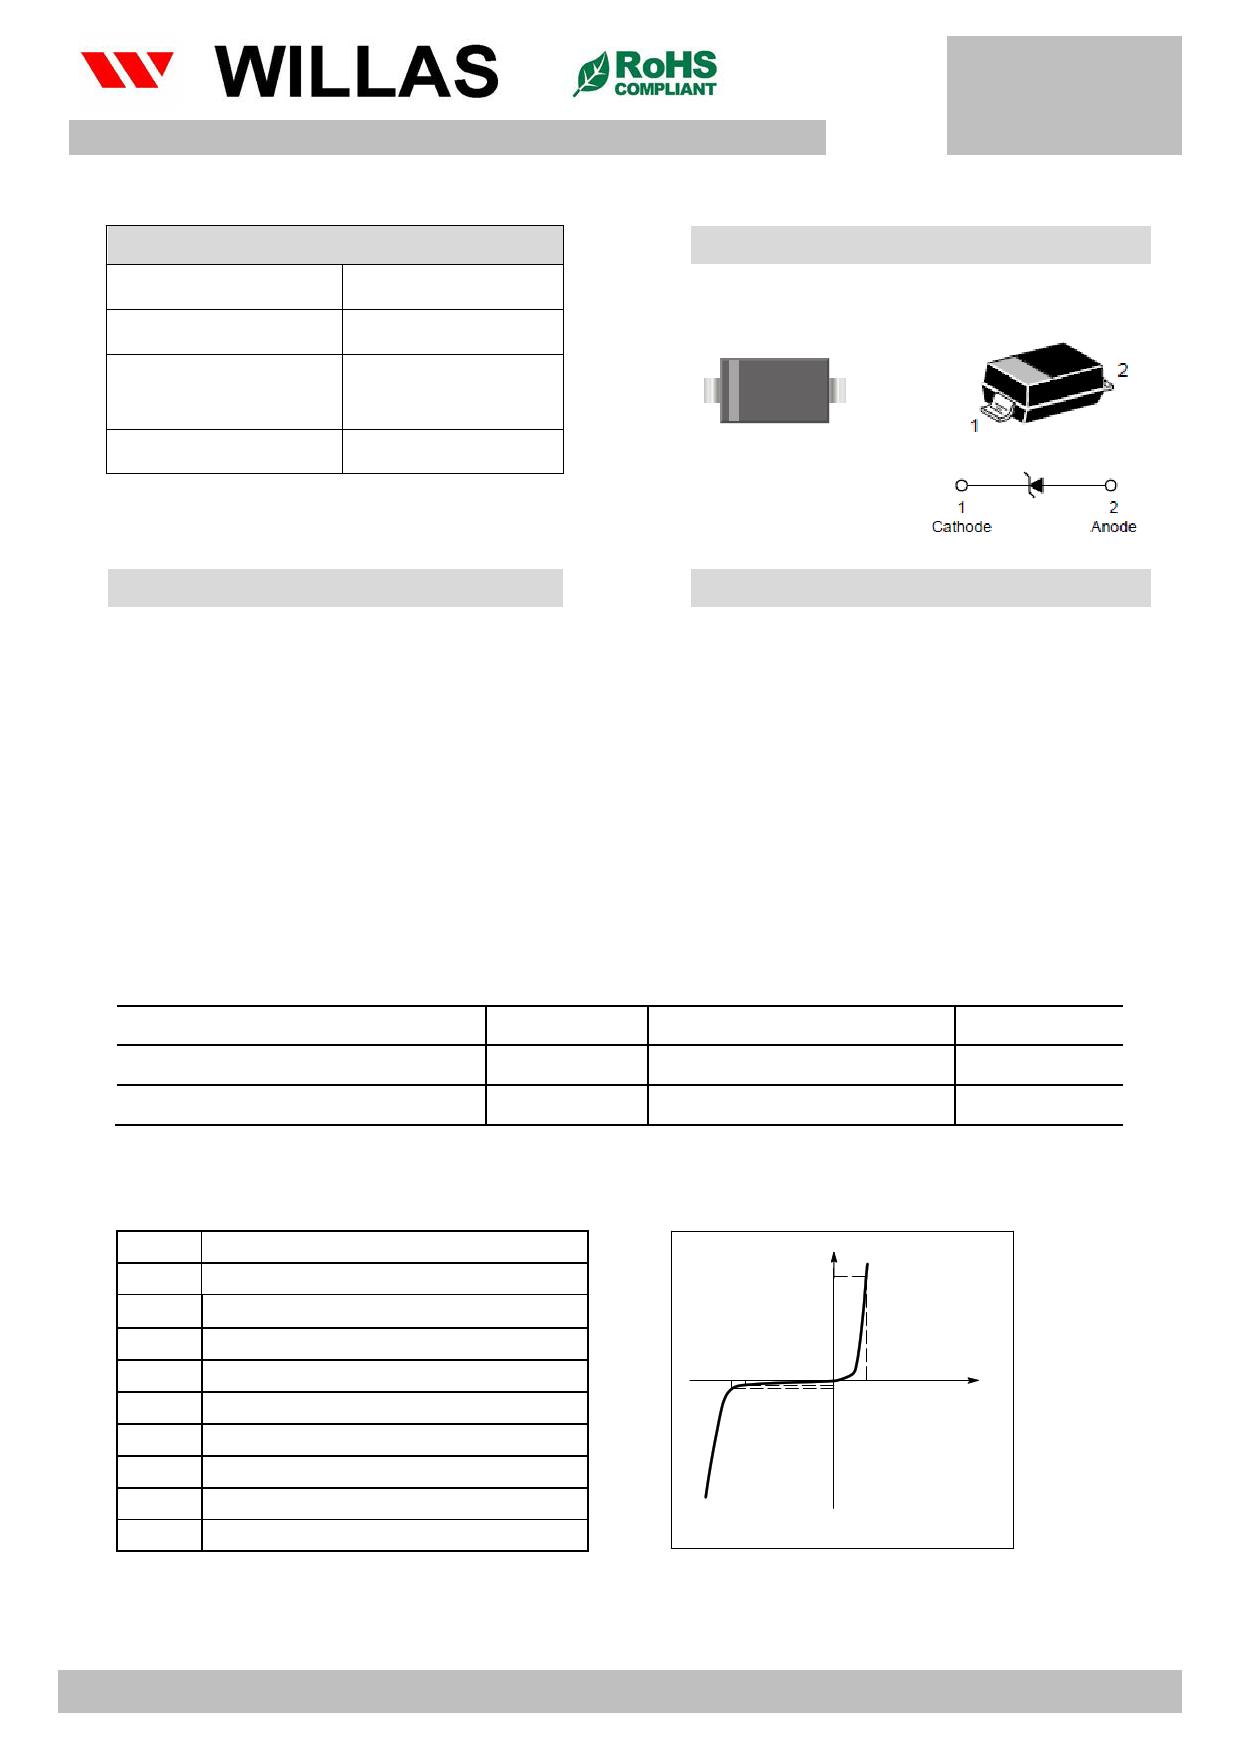 MMSZ5221B Datasheet